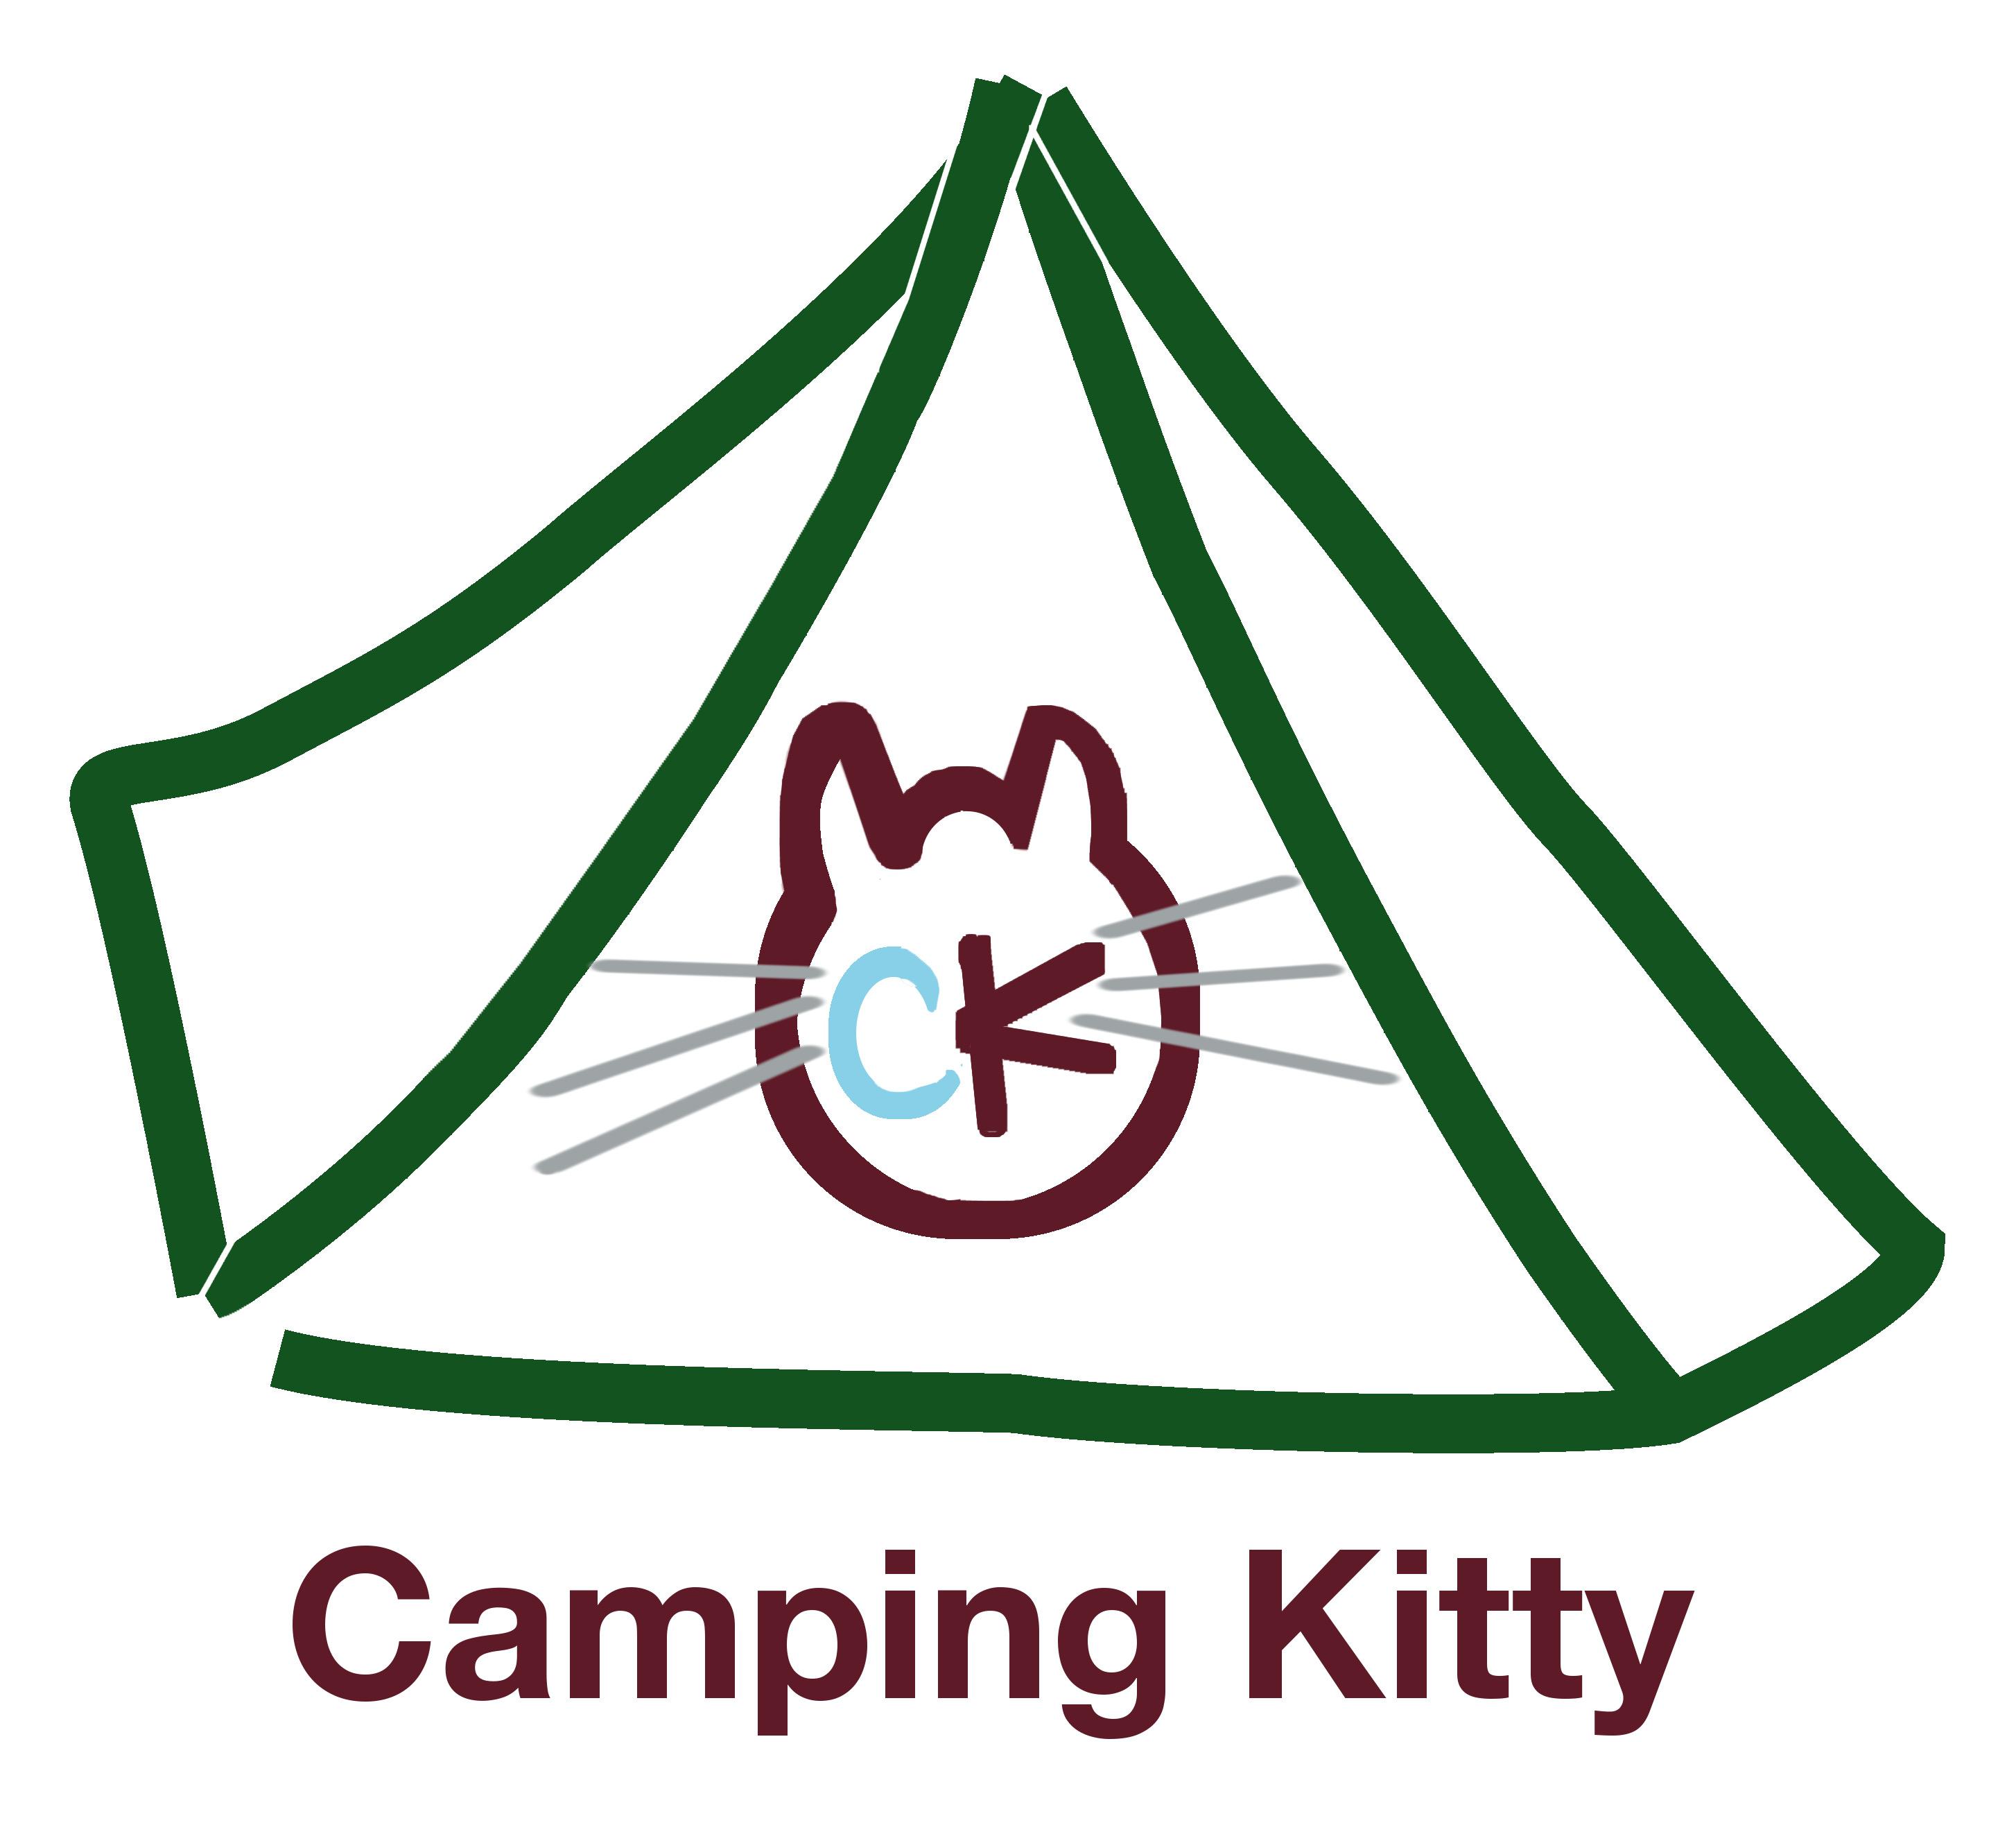 camping kitty logo 1